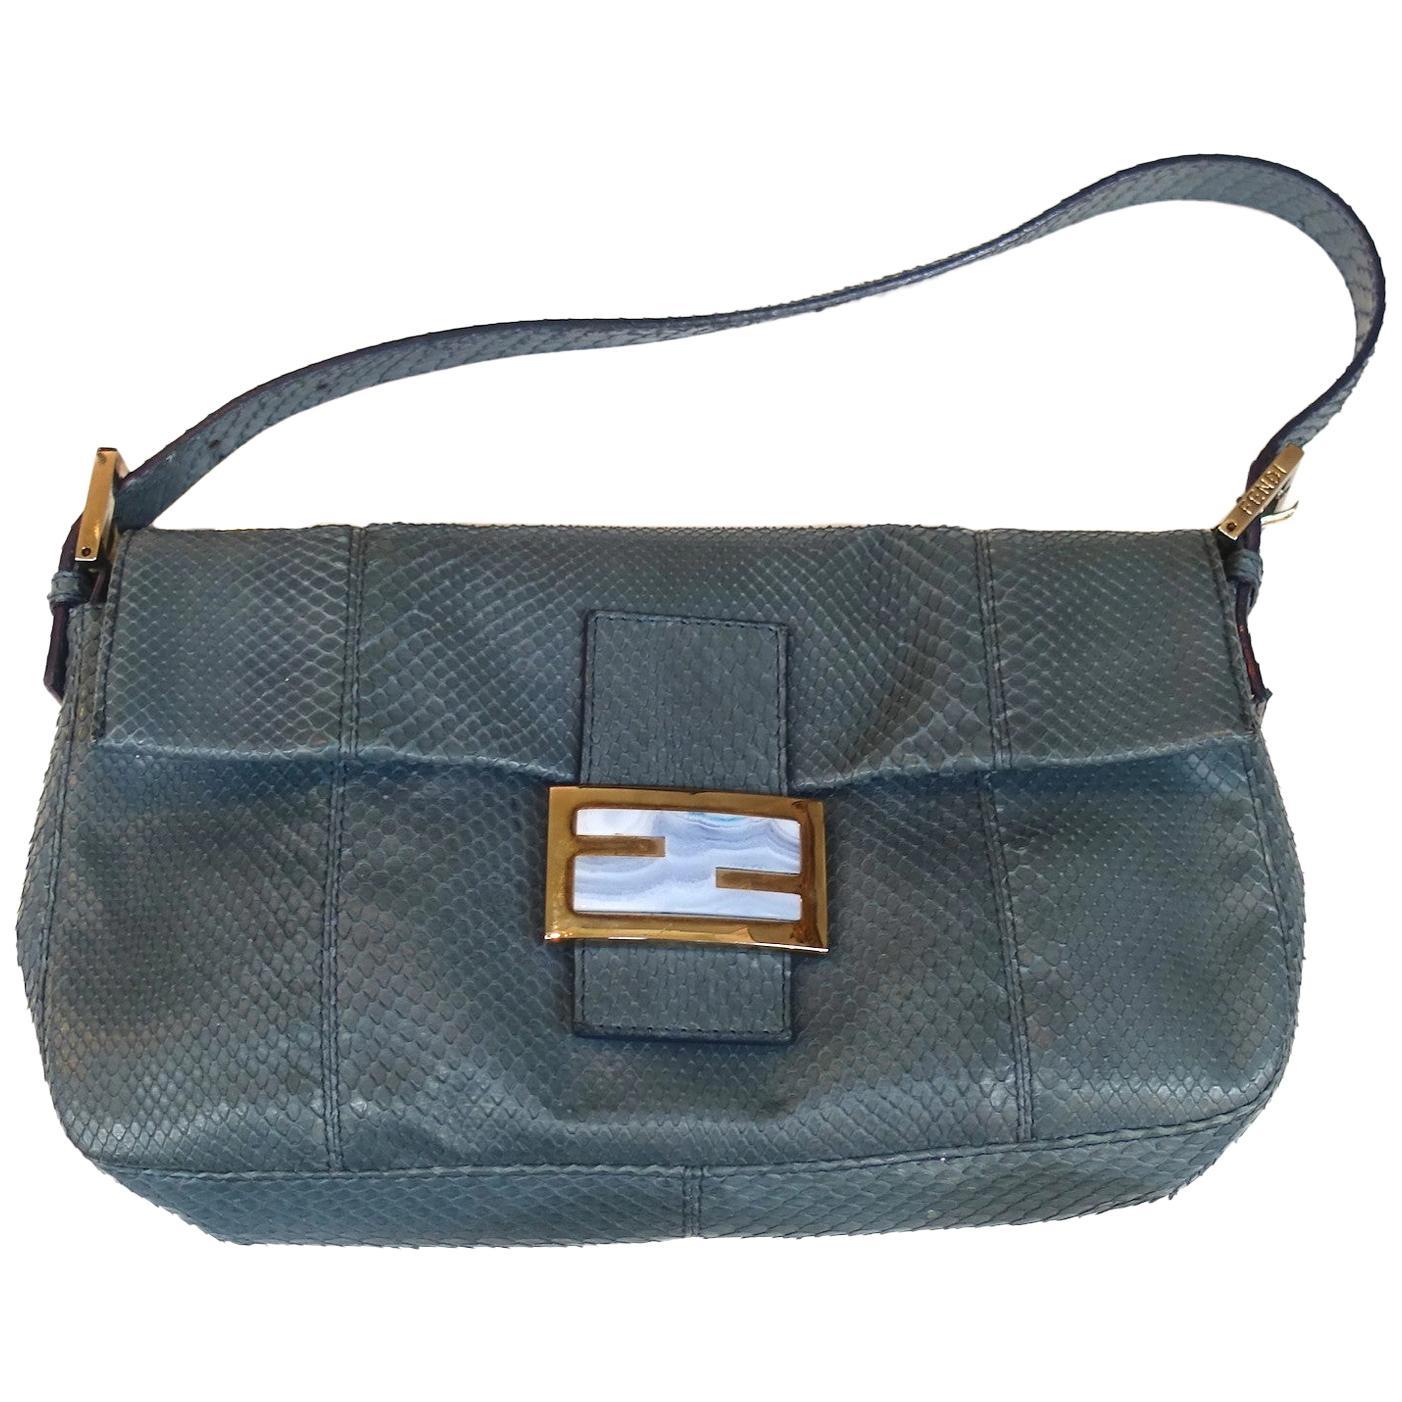 2b4f69246ba Vintage Judith Leiber Handbags and Purses - 235 For Sale at 1stdibs